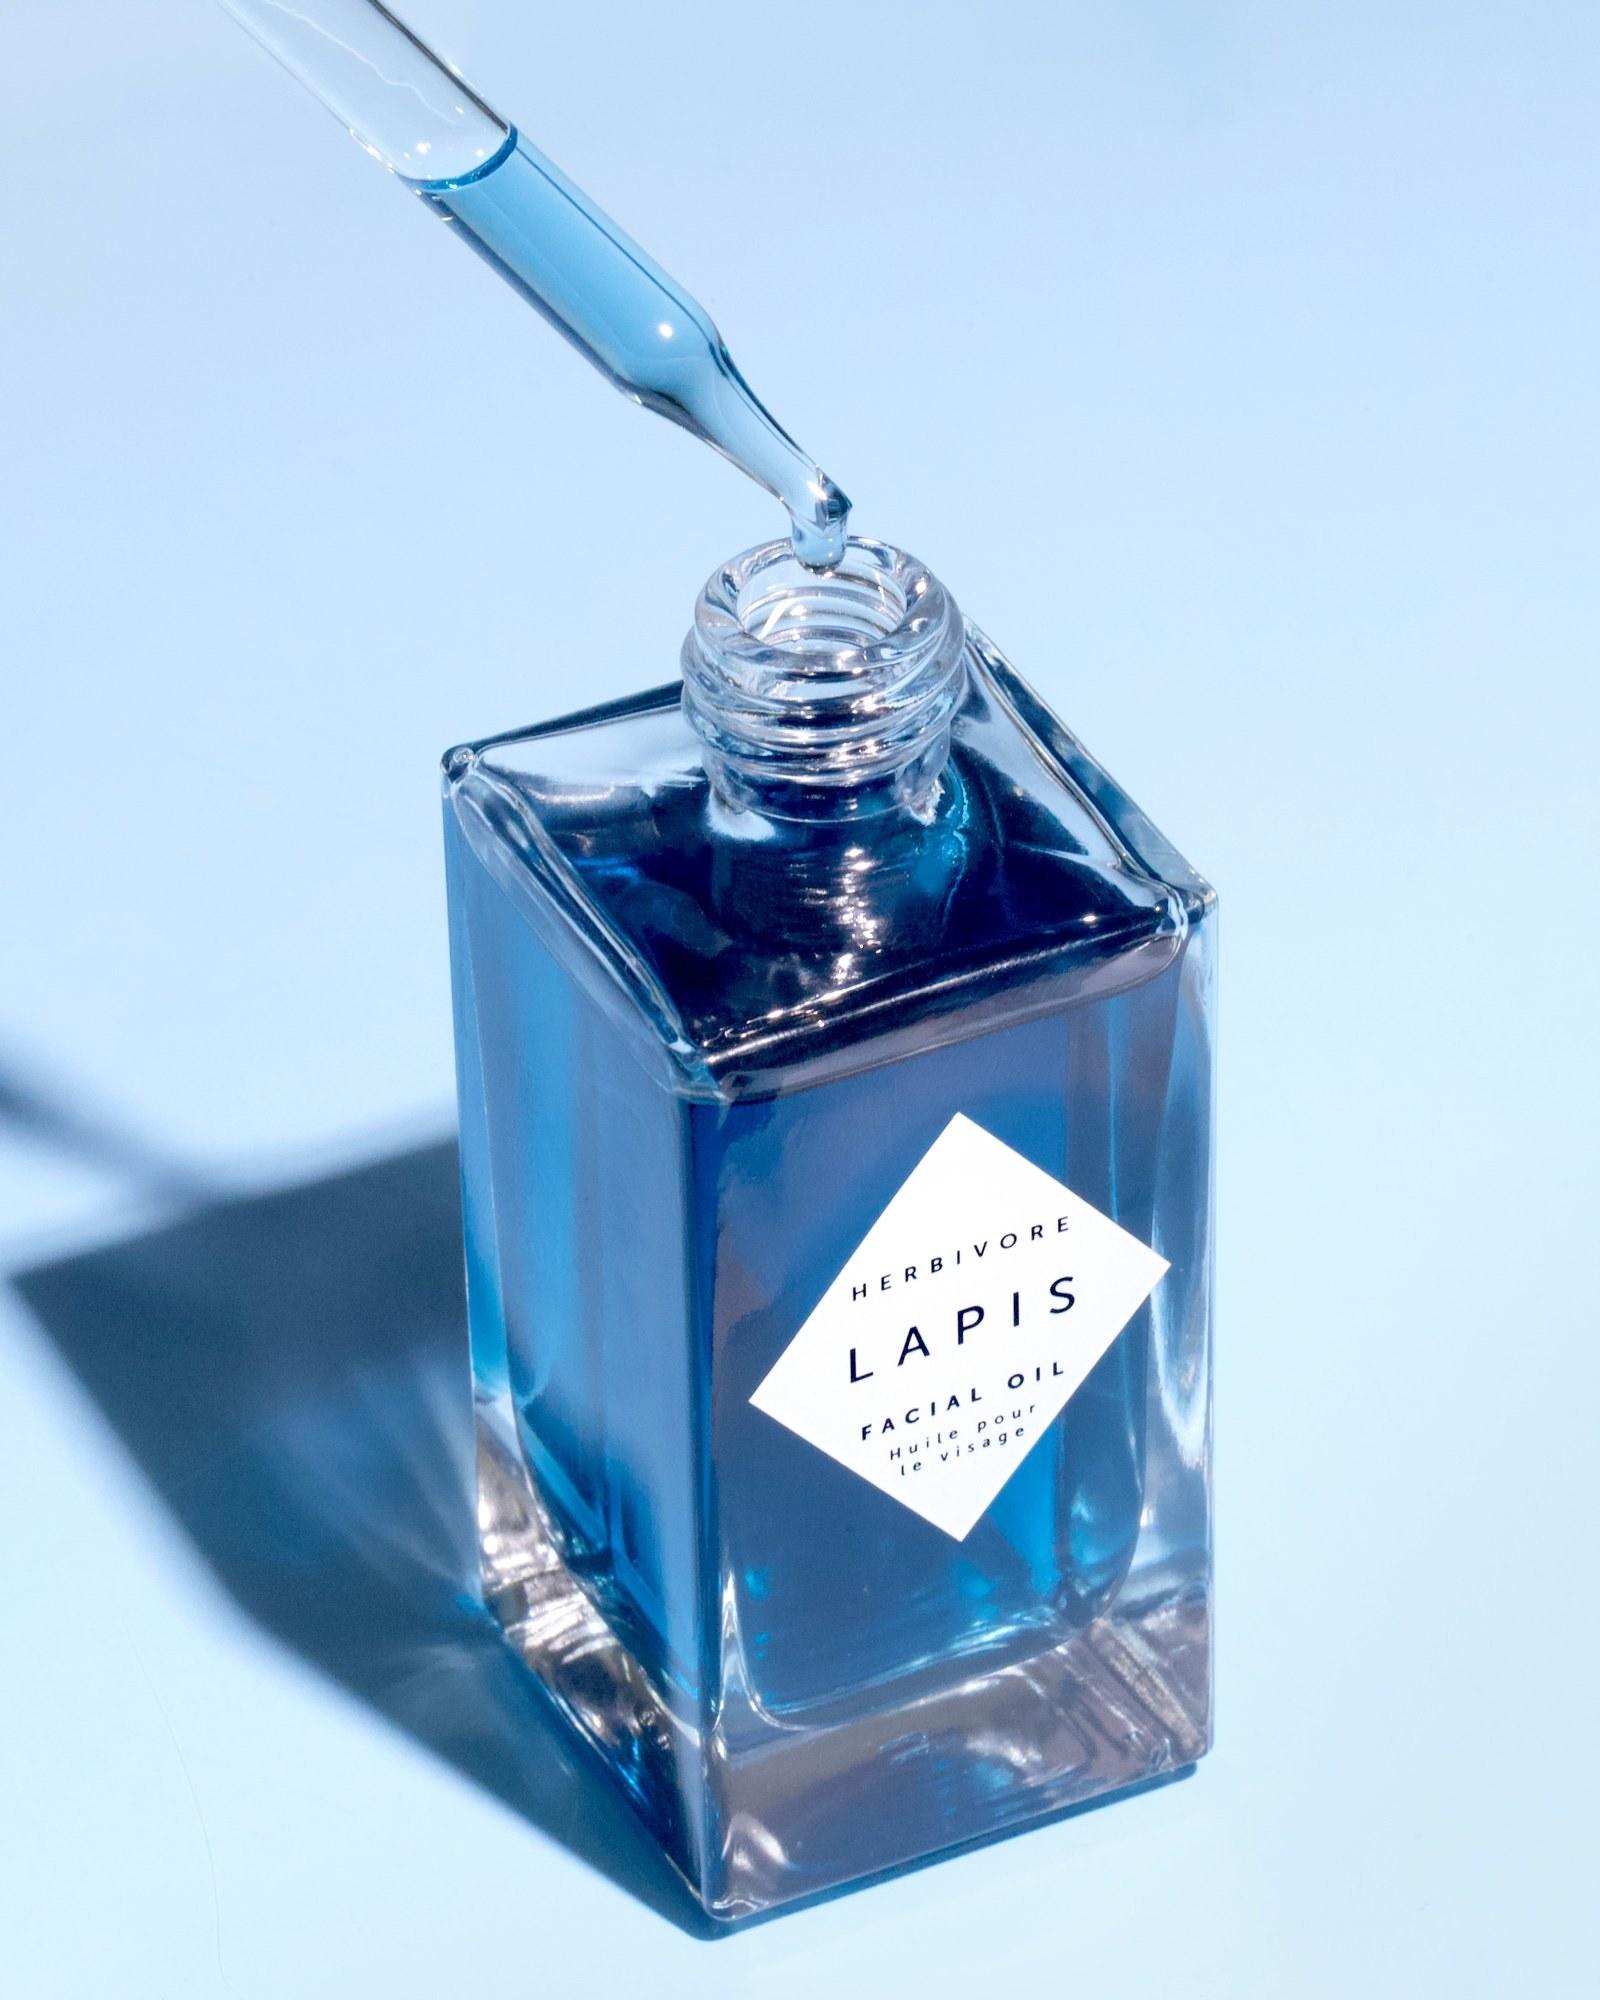 The dropper bottle of blue oil